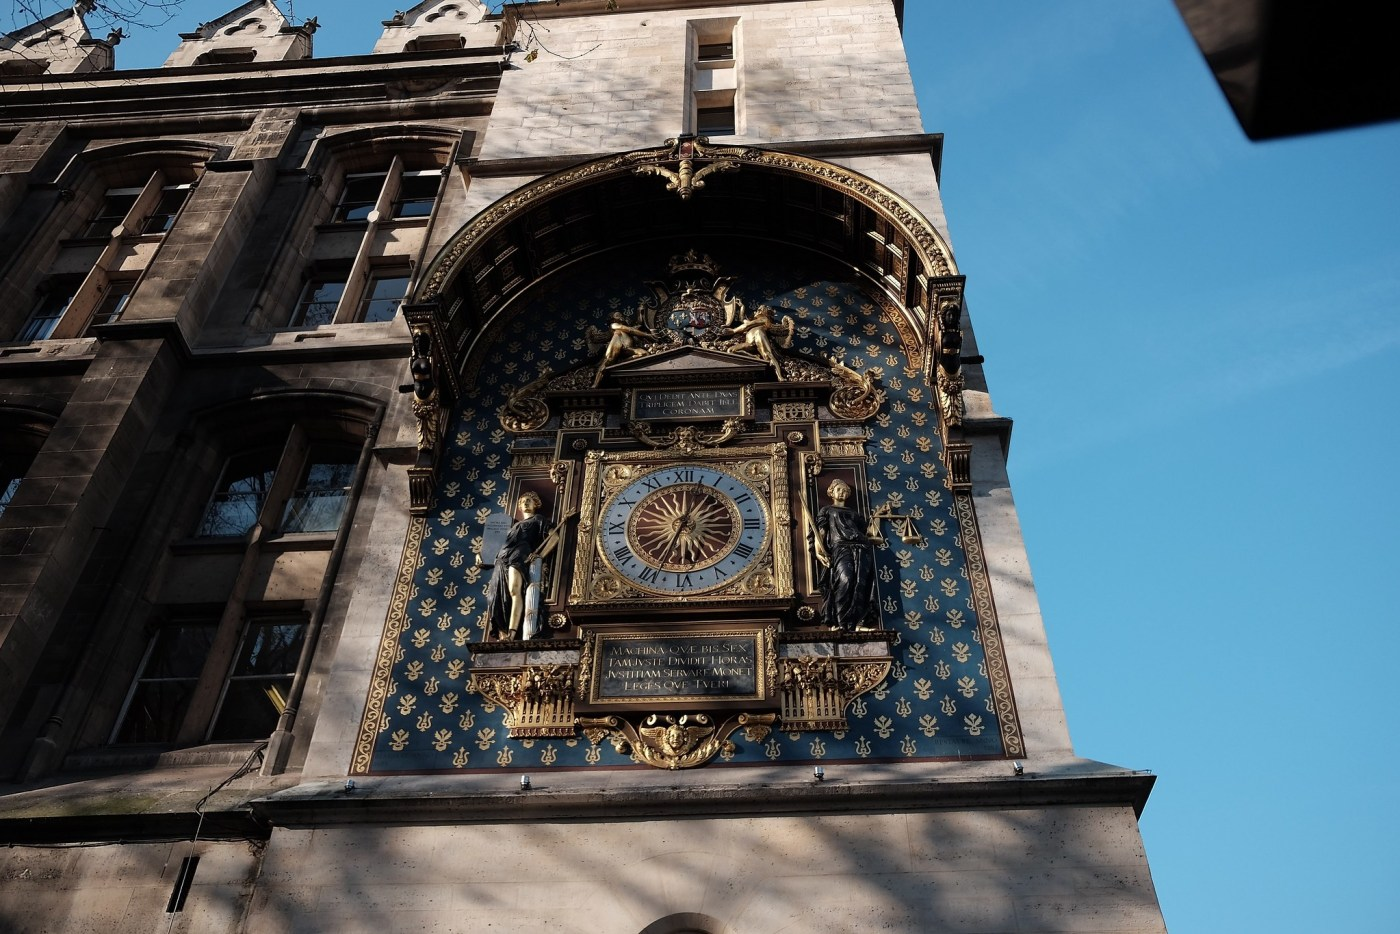 A magnificent clock just off the Qvai De L'Horloge, where Breguet started his first workshop